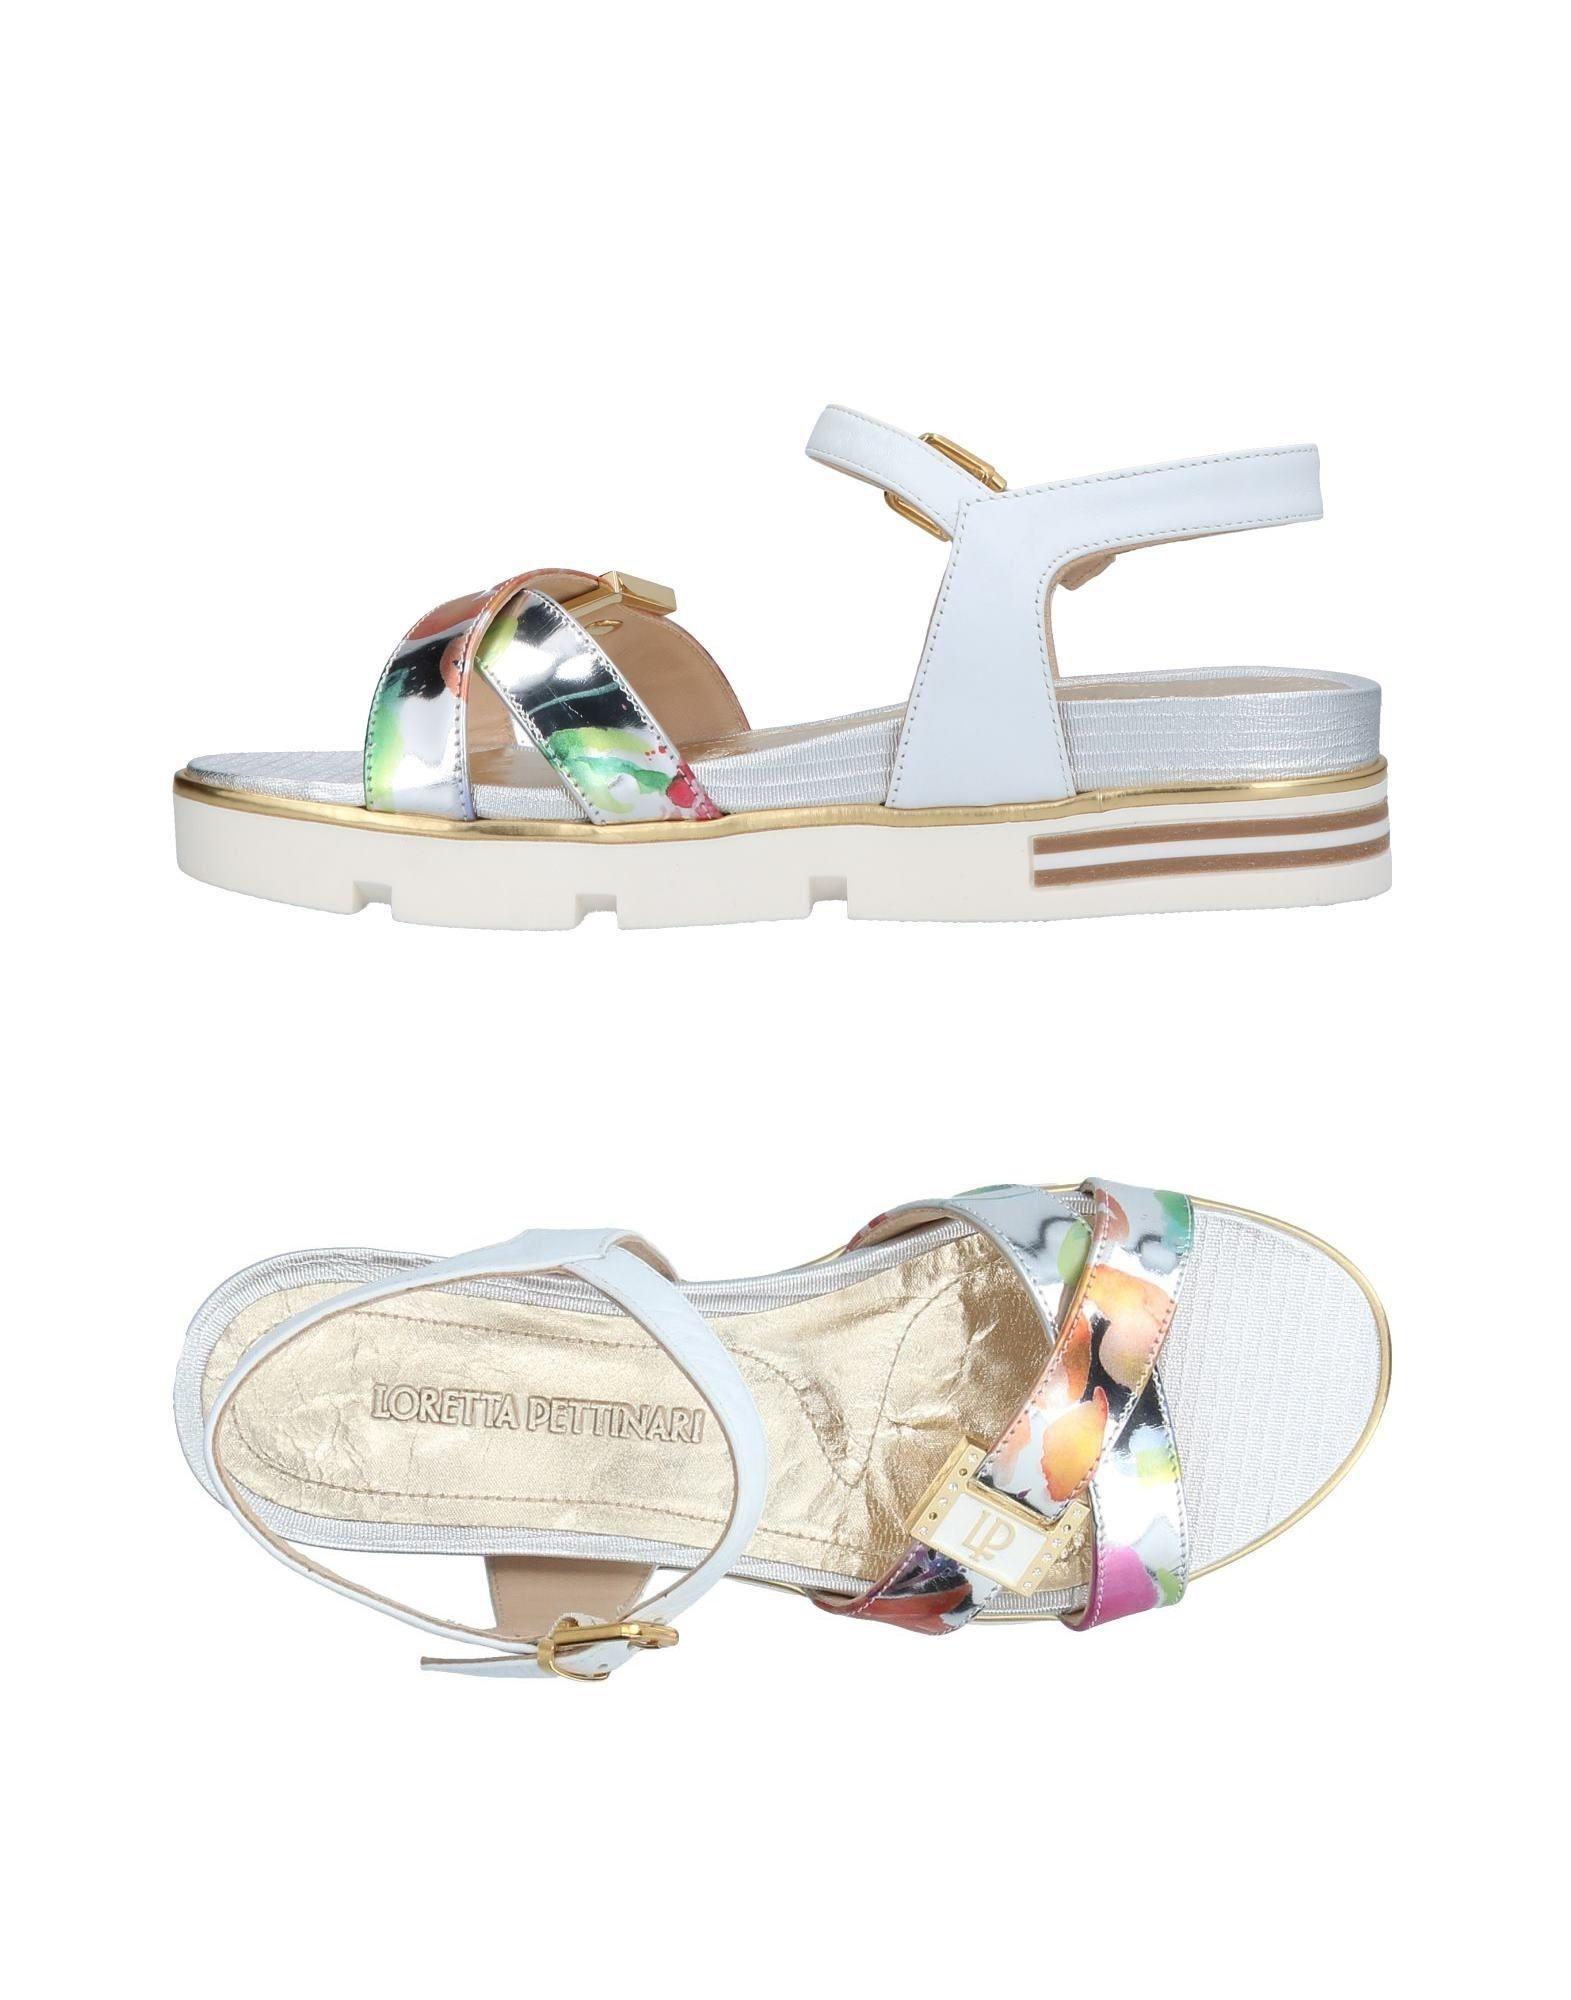 Loretta Pettinari Sandalen Damen  11388026HA Gute Qualität beliebte Schuhe